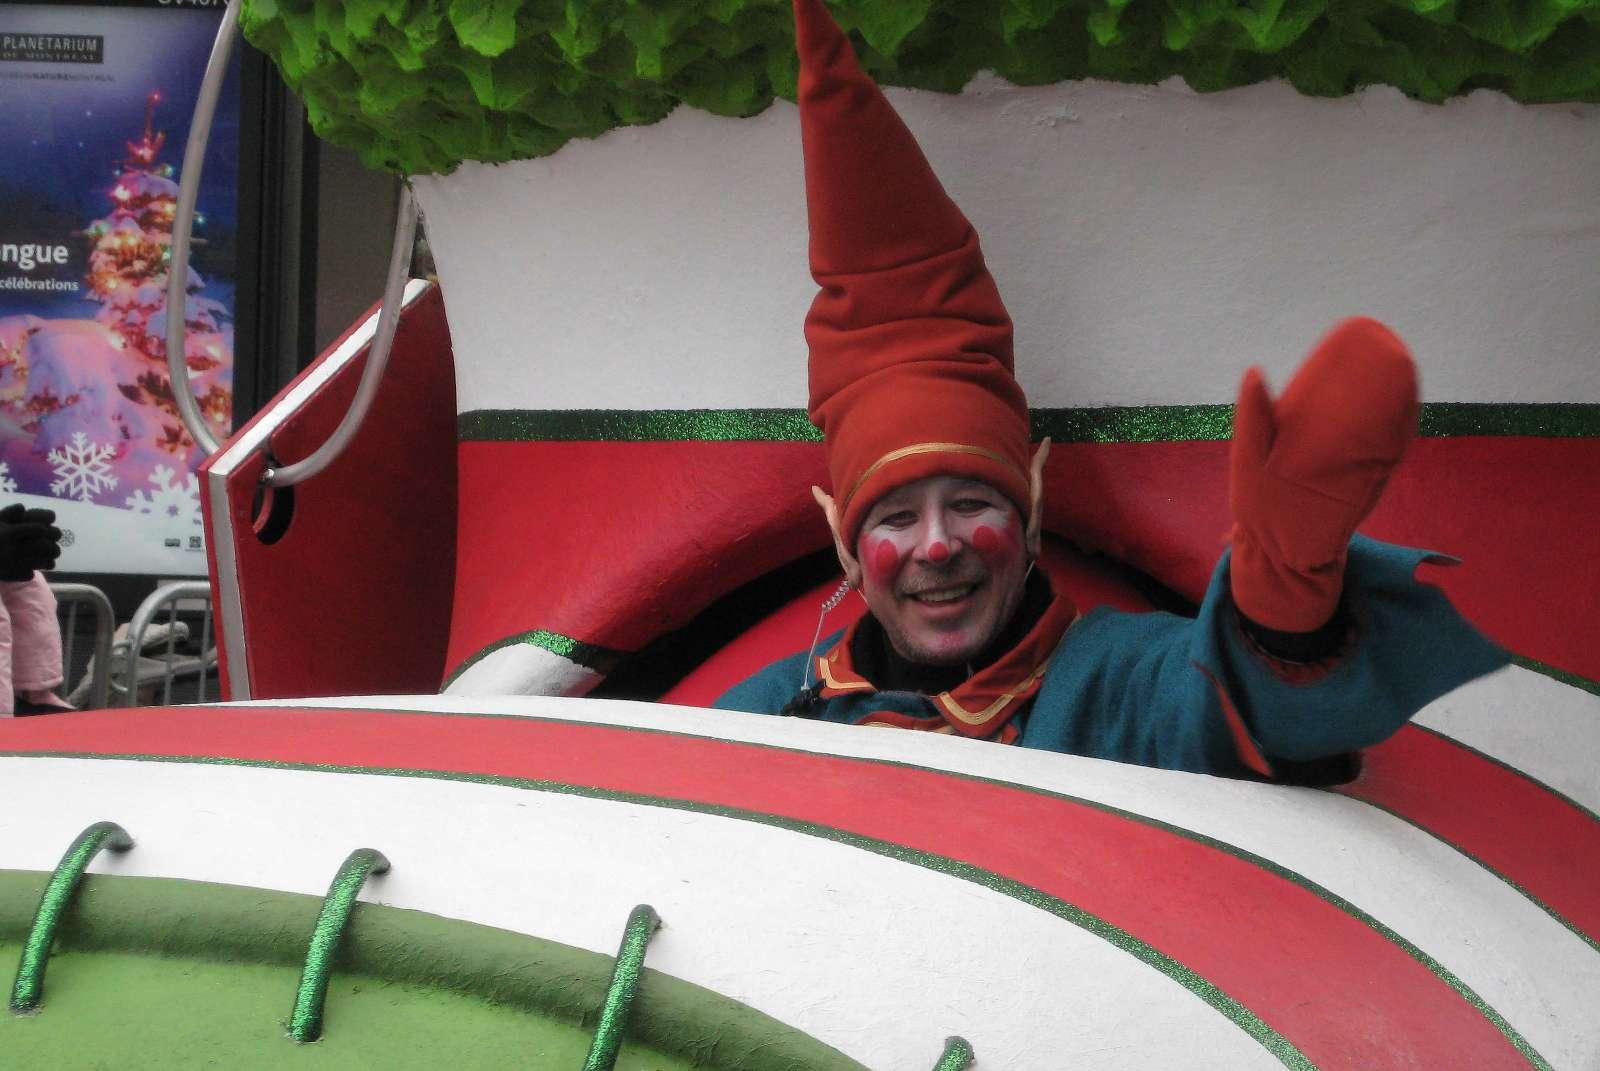 Montreal Santa Claude Parade 2014 edition